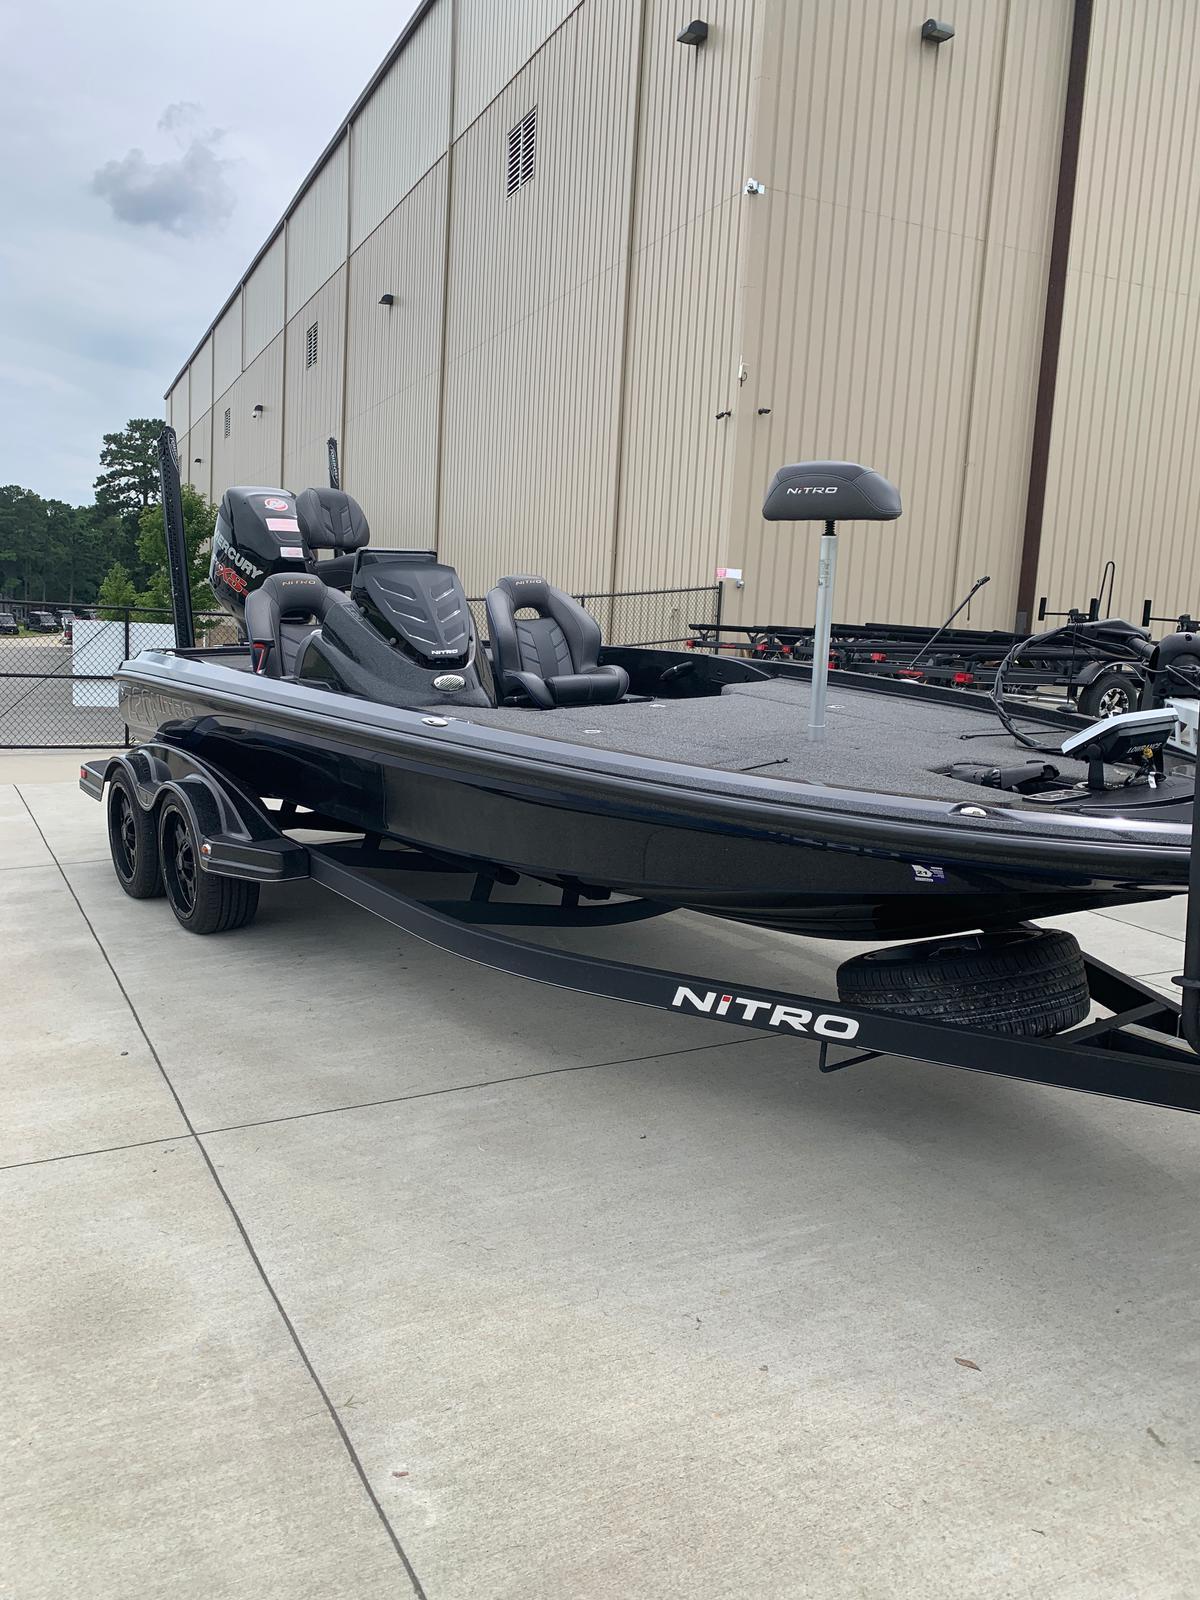 2018 Nitro boat for sale, model of the boat is Z20 & Image # 27 of 32